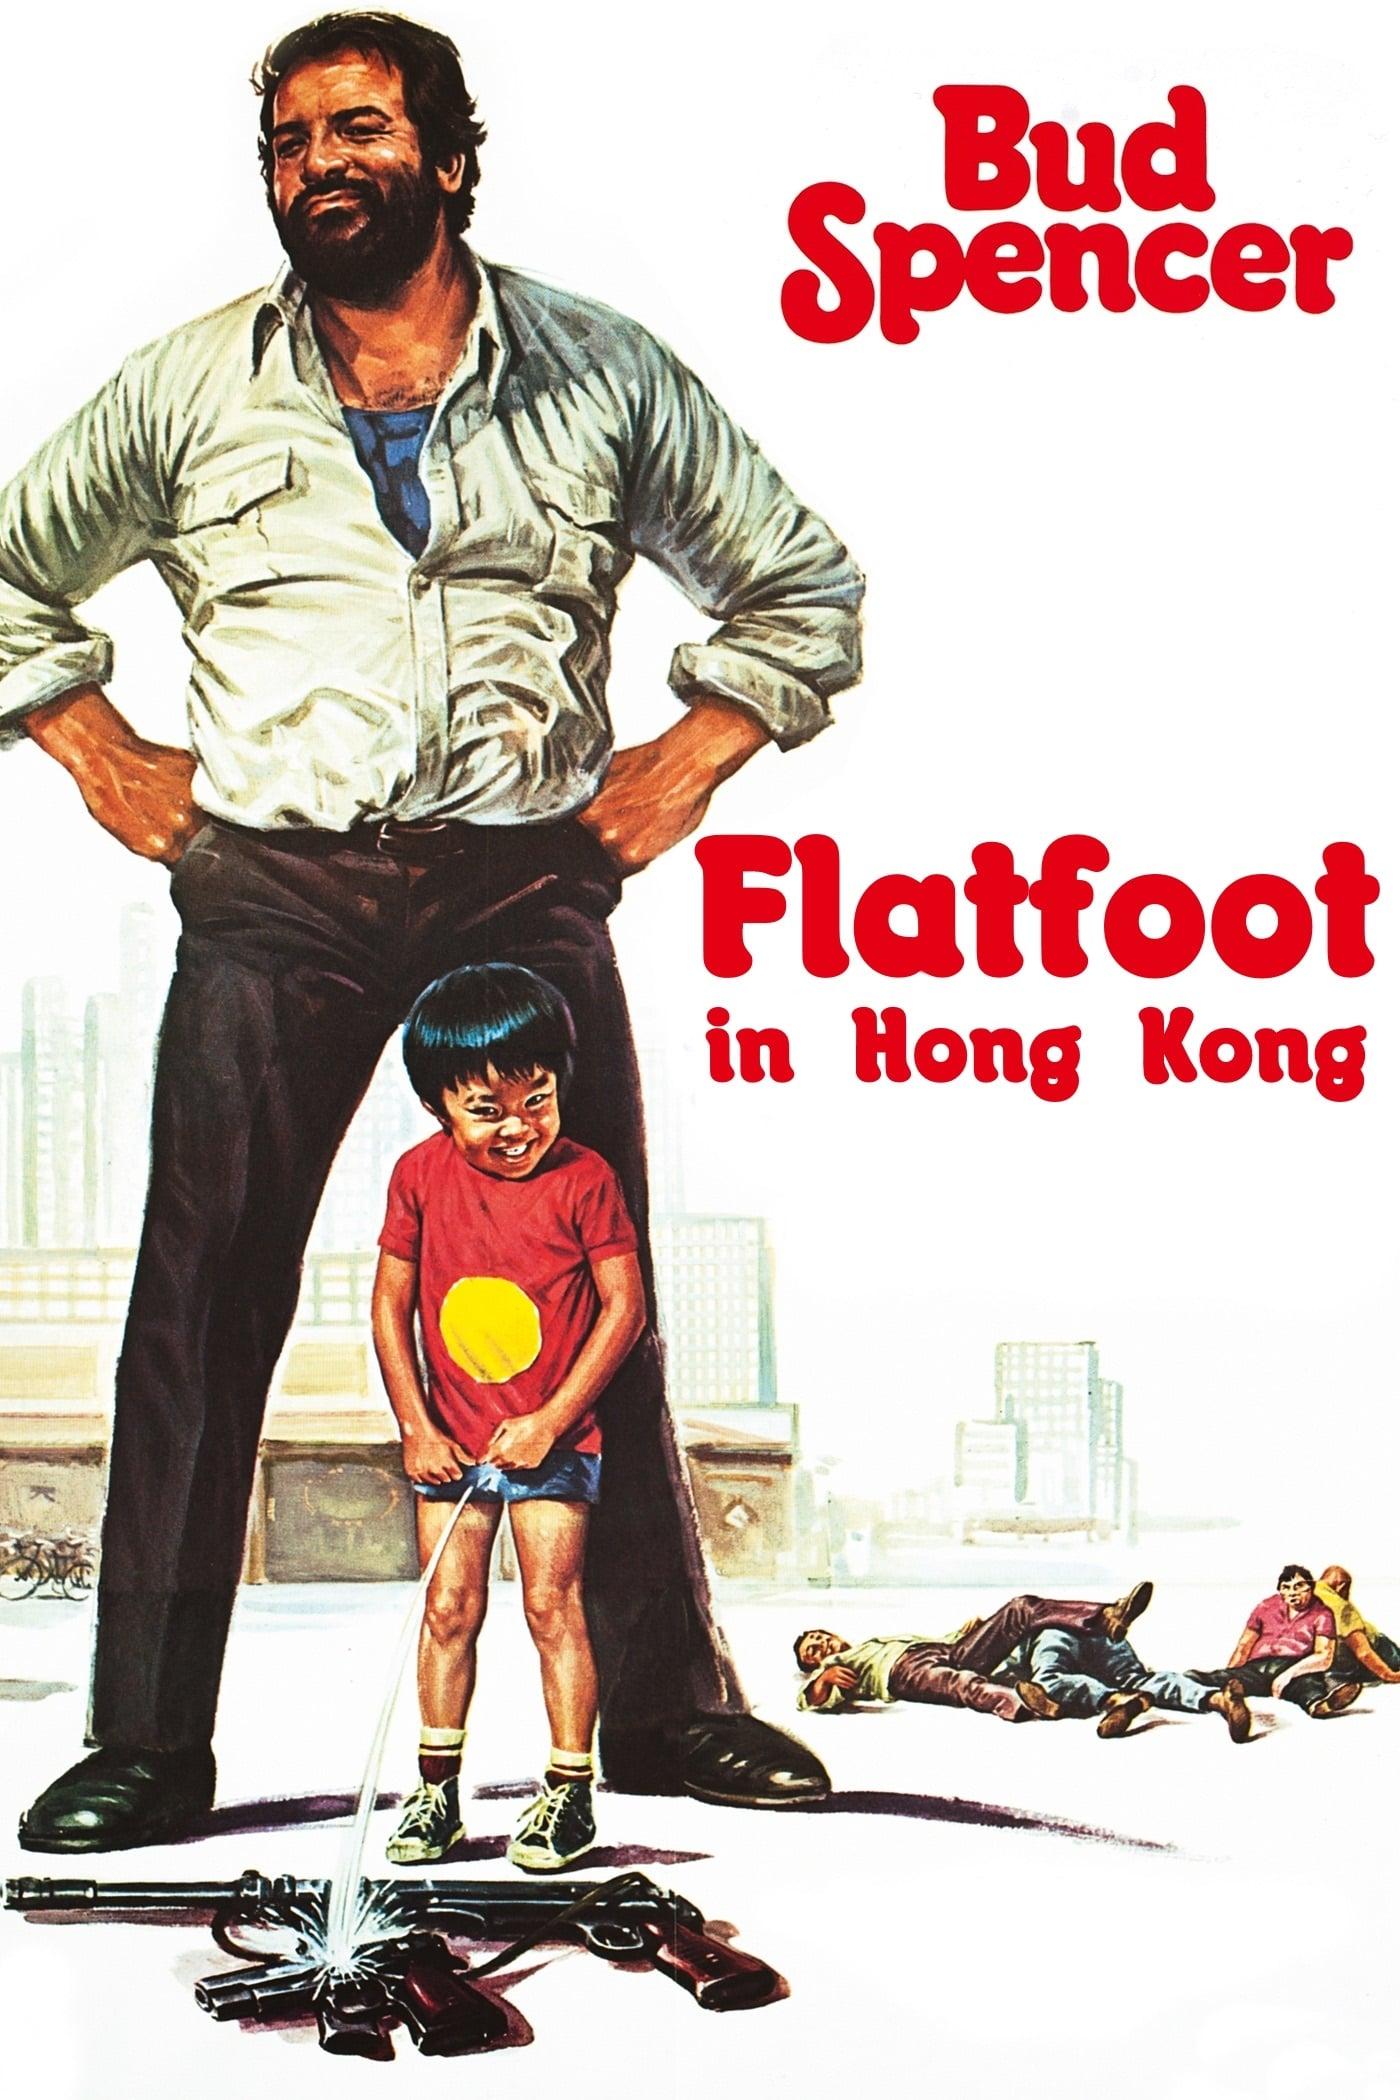 Flatfoot in Hong Kong (1975)